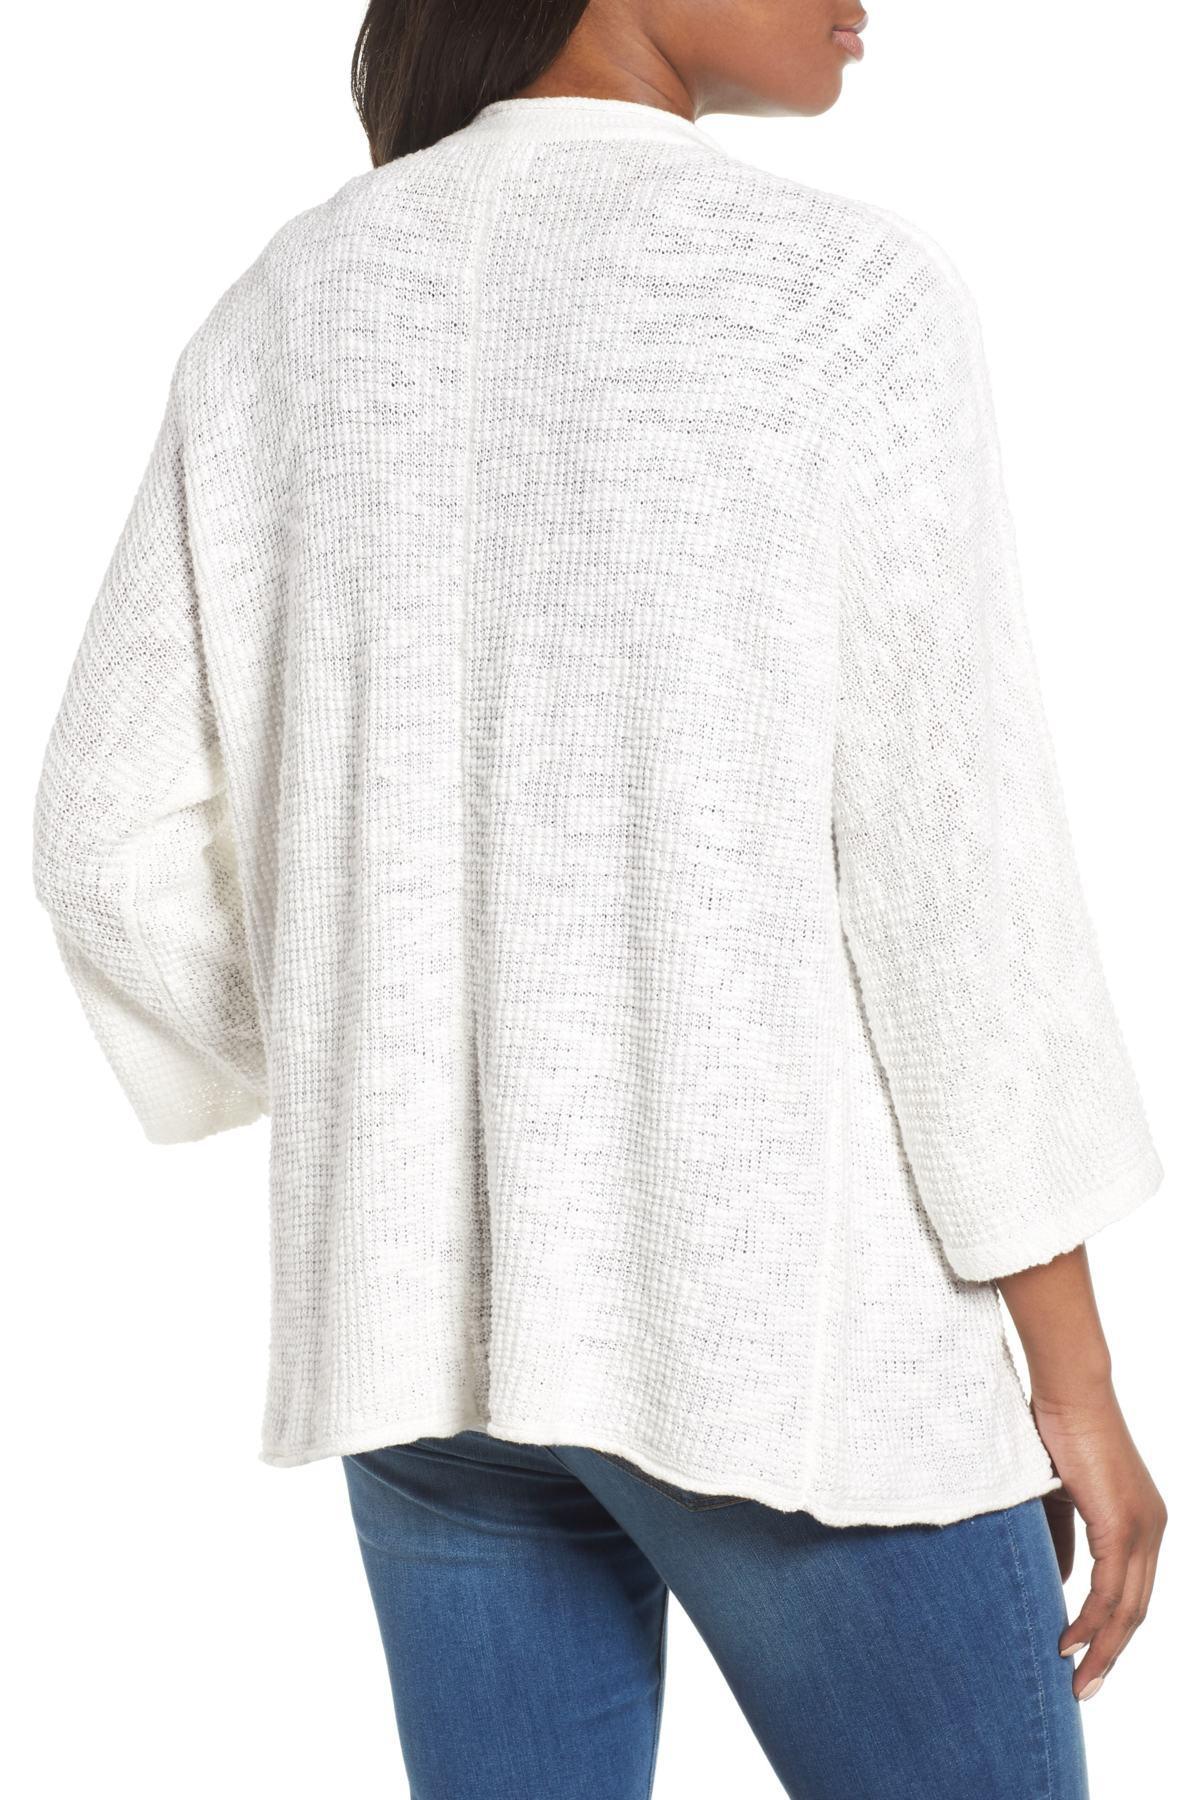 2319cf04f Lyst - Caslon (r) Drape Front Cotton Blend Cardigan (regular ...